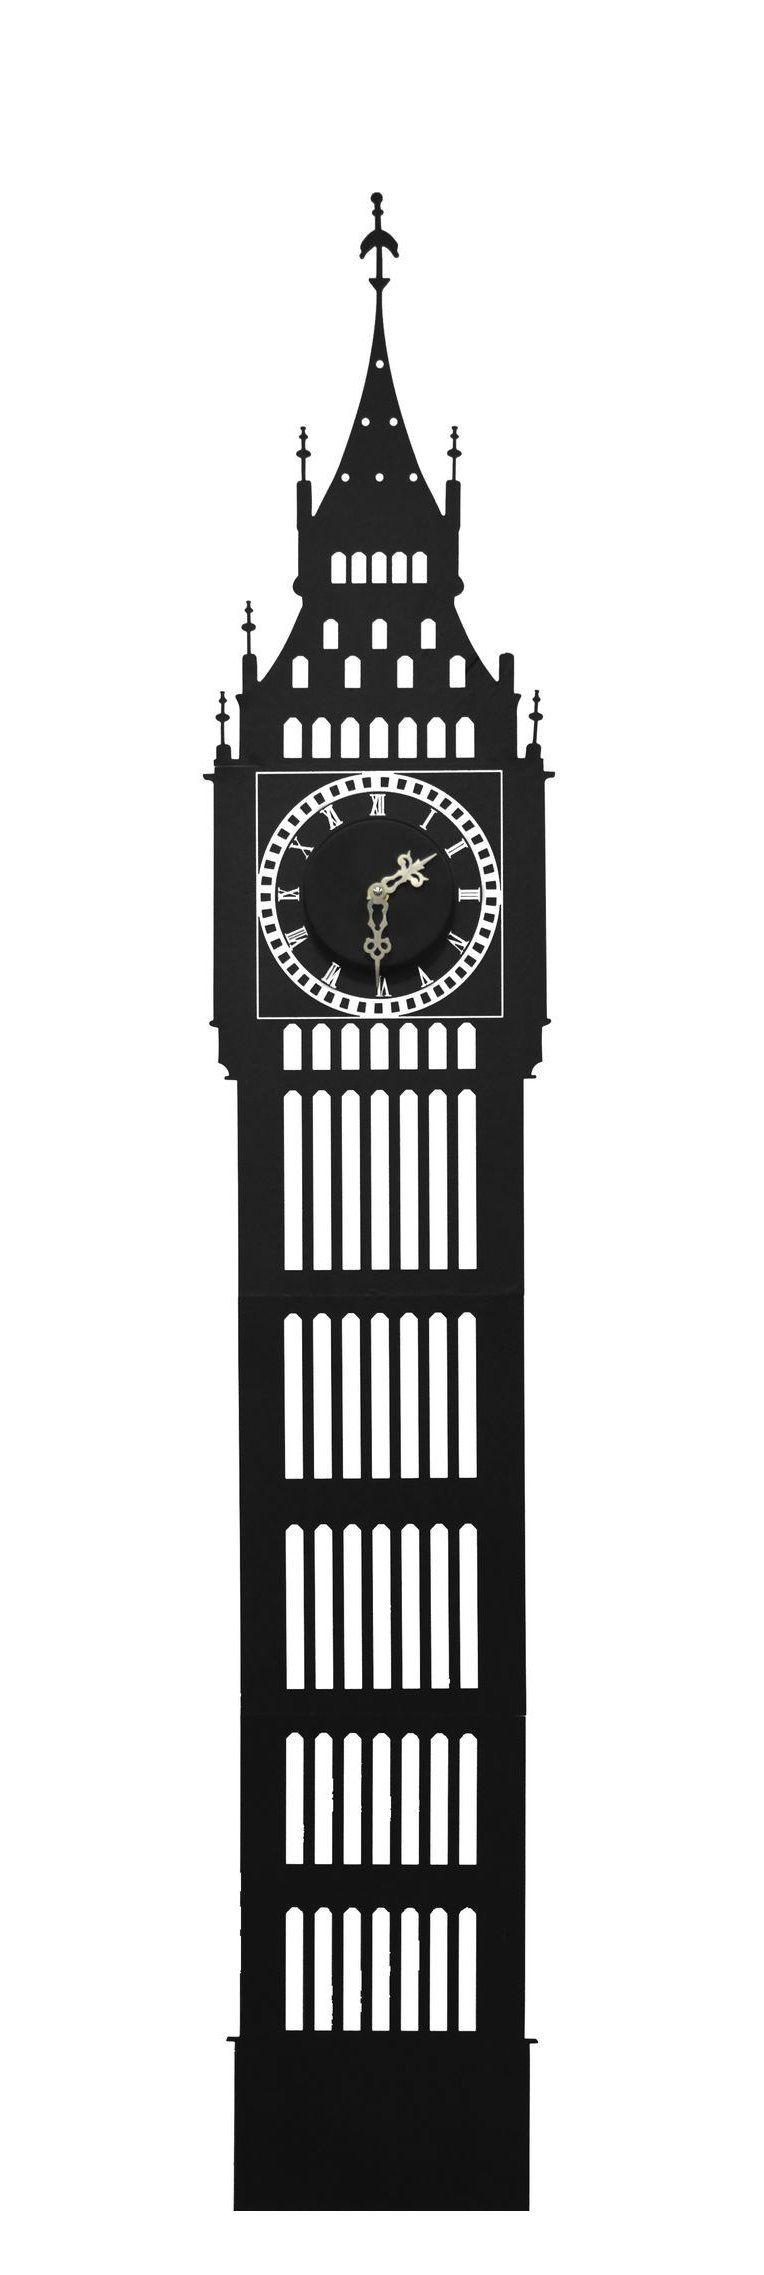 Tick Tock You Don T Stop Big Ben Png Bigbenpng Discover Classic And Modern Clocks On Houseandgarden Co Uk Find M Big Ben Drawing Big Ben London Big Ben Art